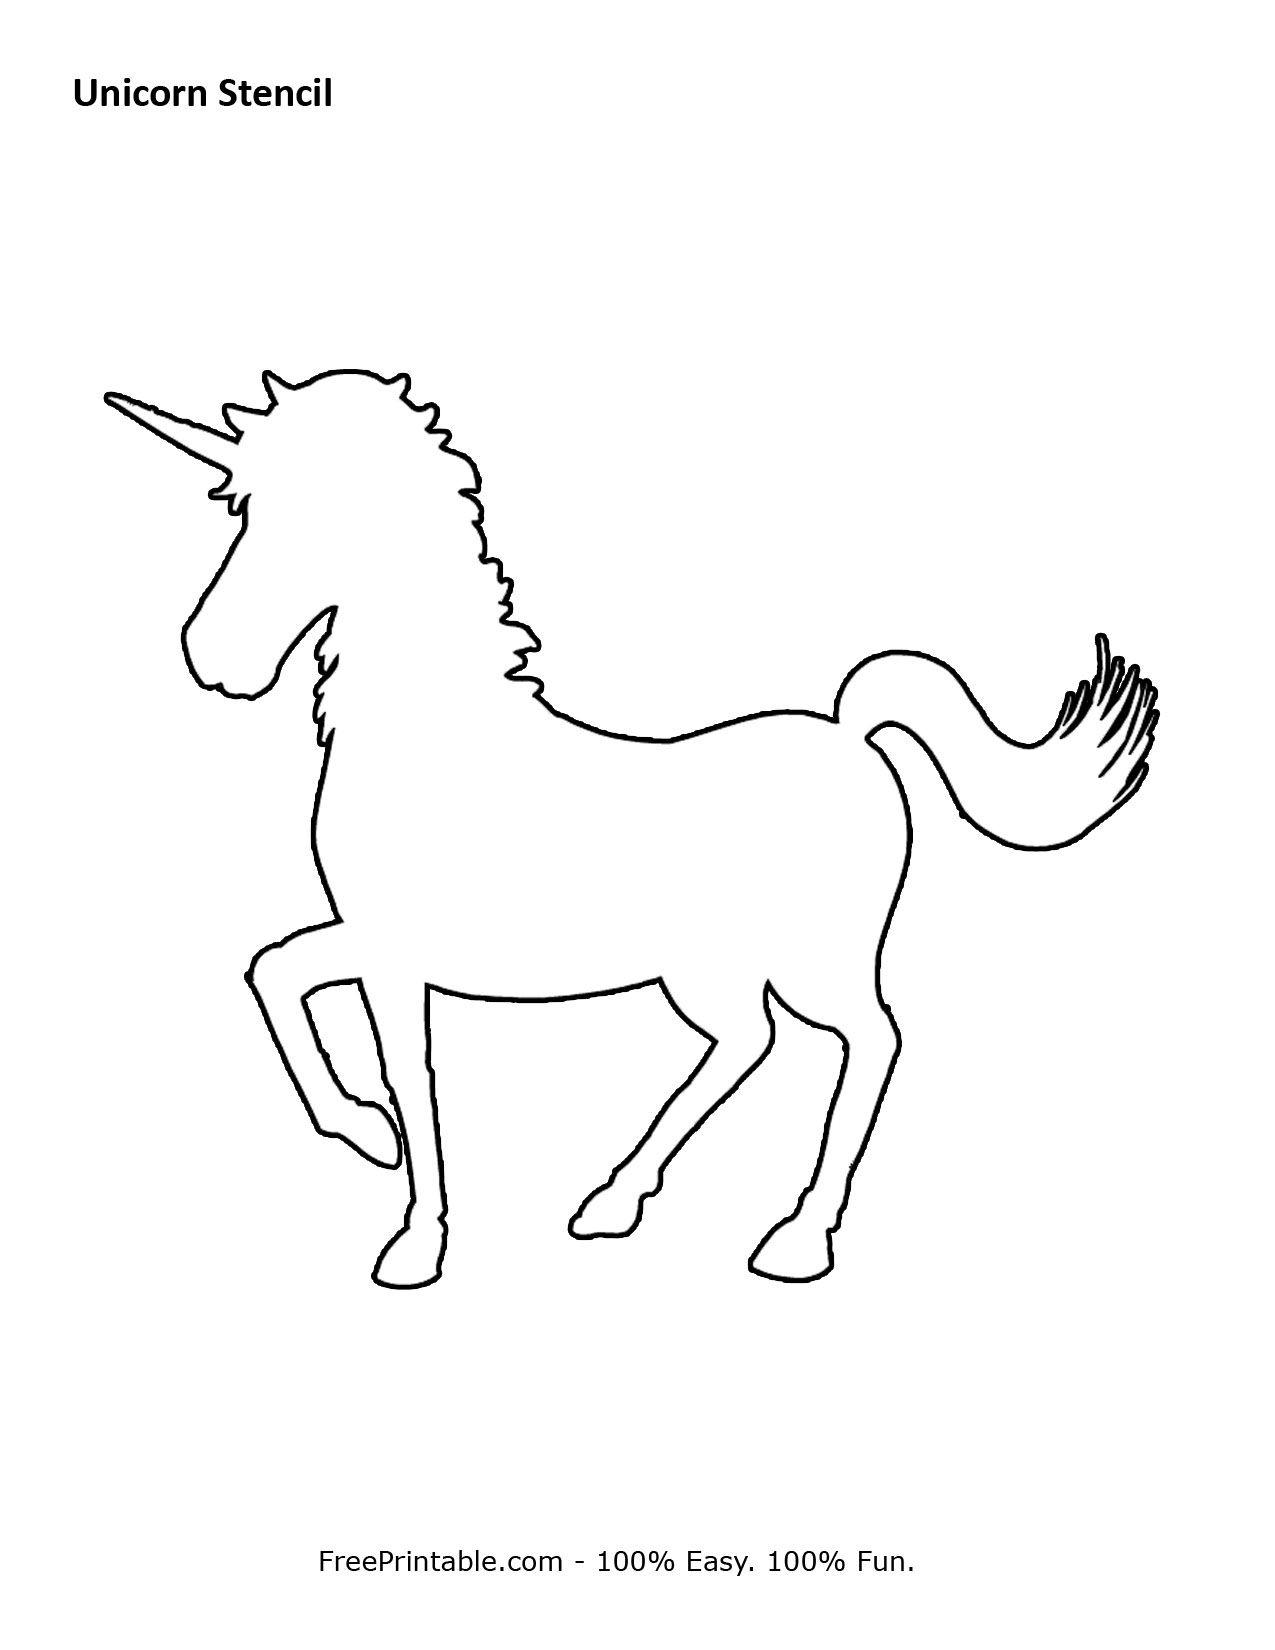 Free Printable Unicorn Stencils | Crafts & Sewing | Pinterest - Free Printable Stencils